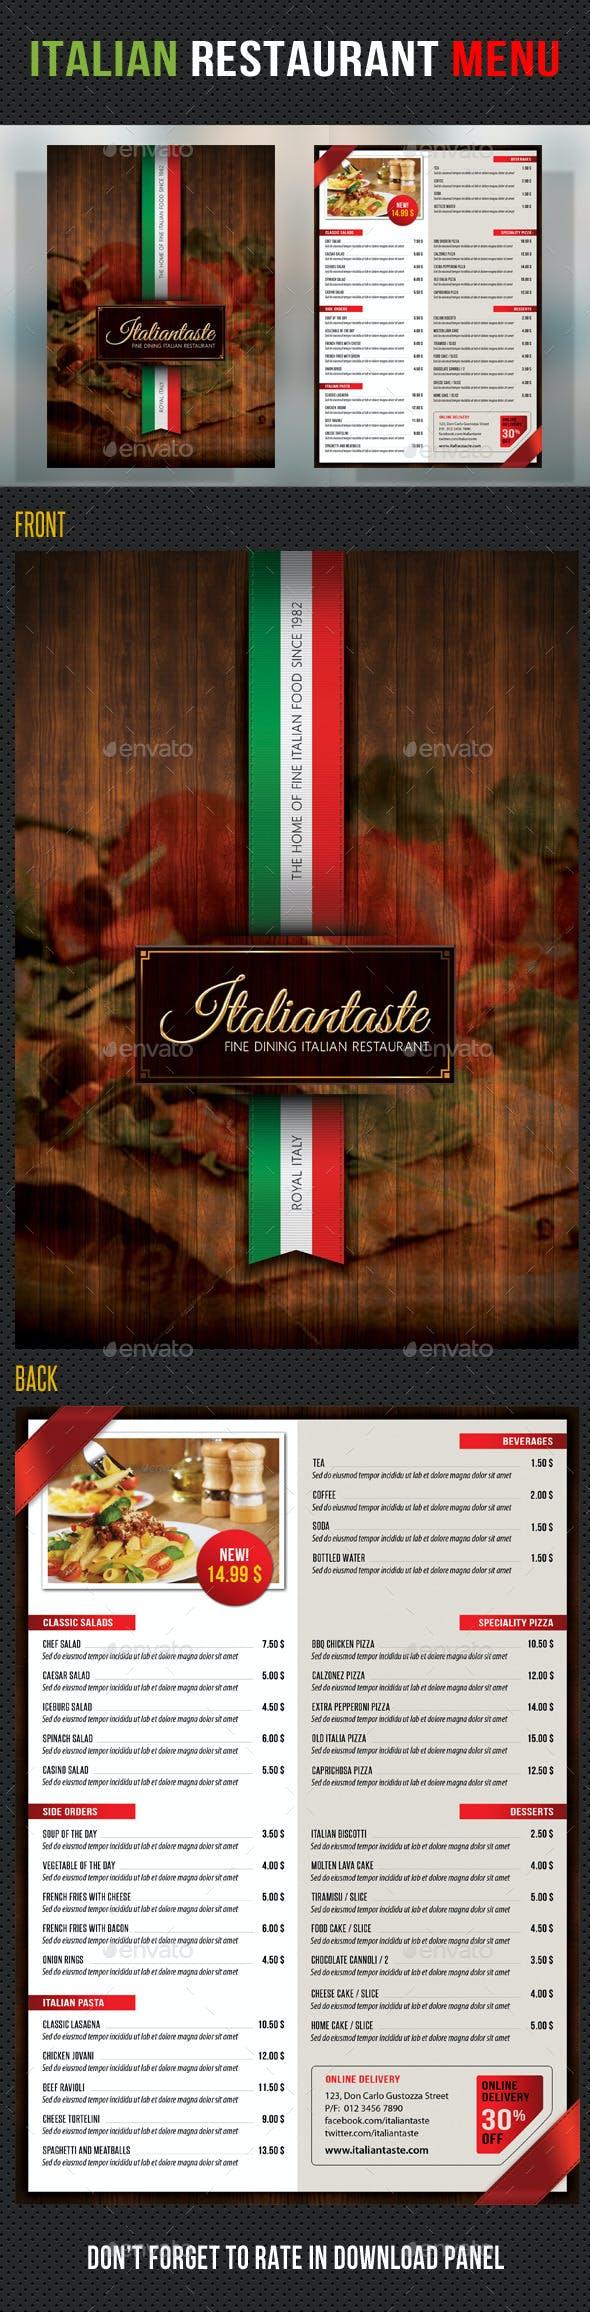 italian restaurant menu template by rapidgraf graphicriver